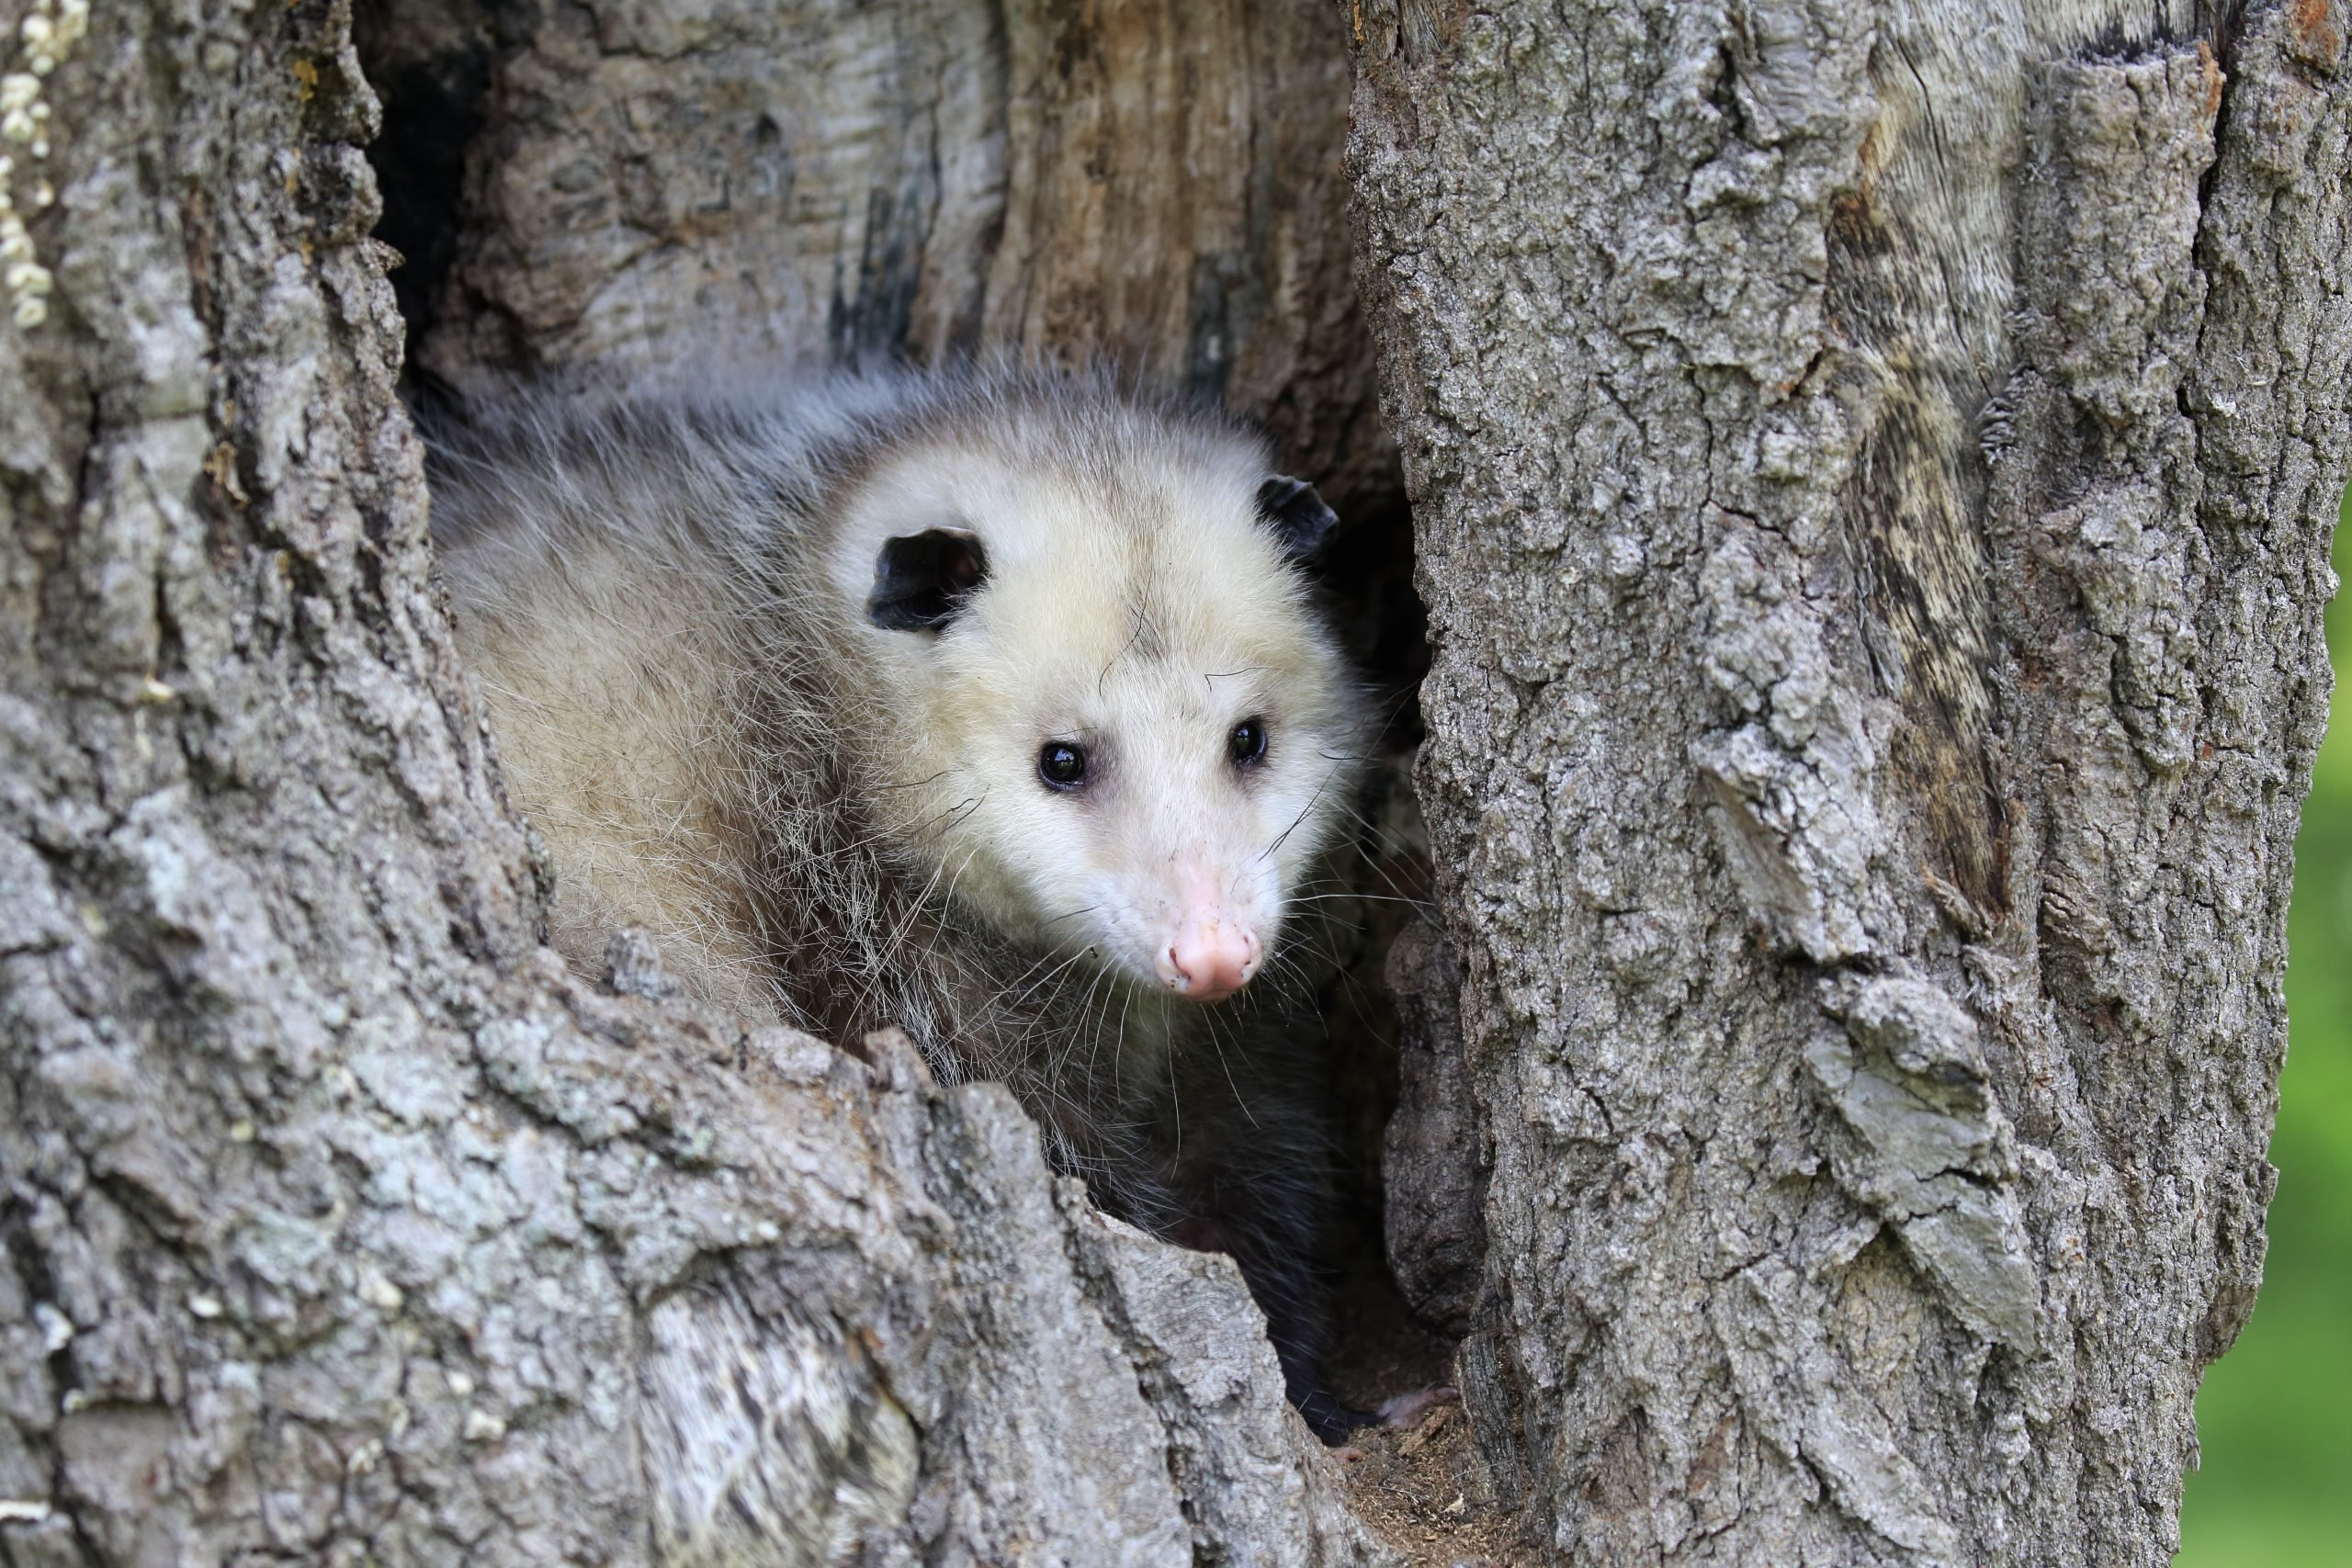 Virginia opossum, North American opossum, (Didelphis virginiana), adult looking out of den, Pine County, Minnesota, USA, North America